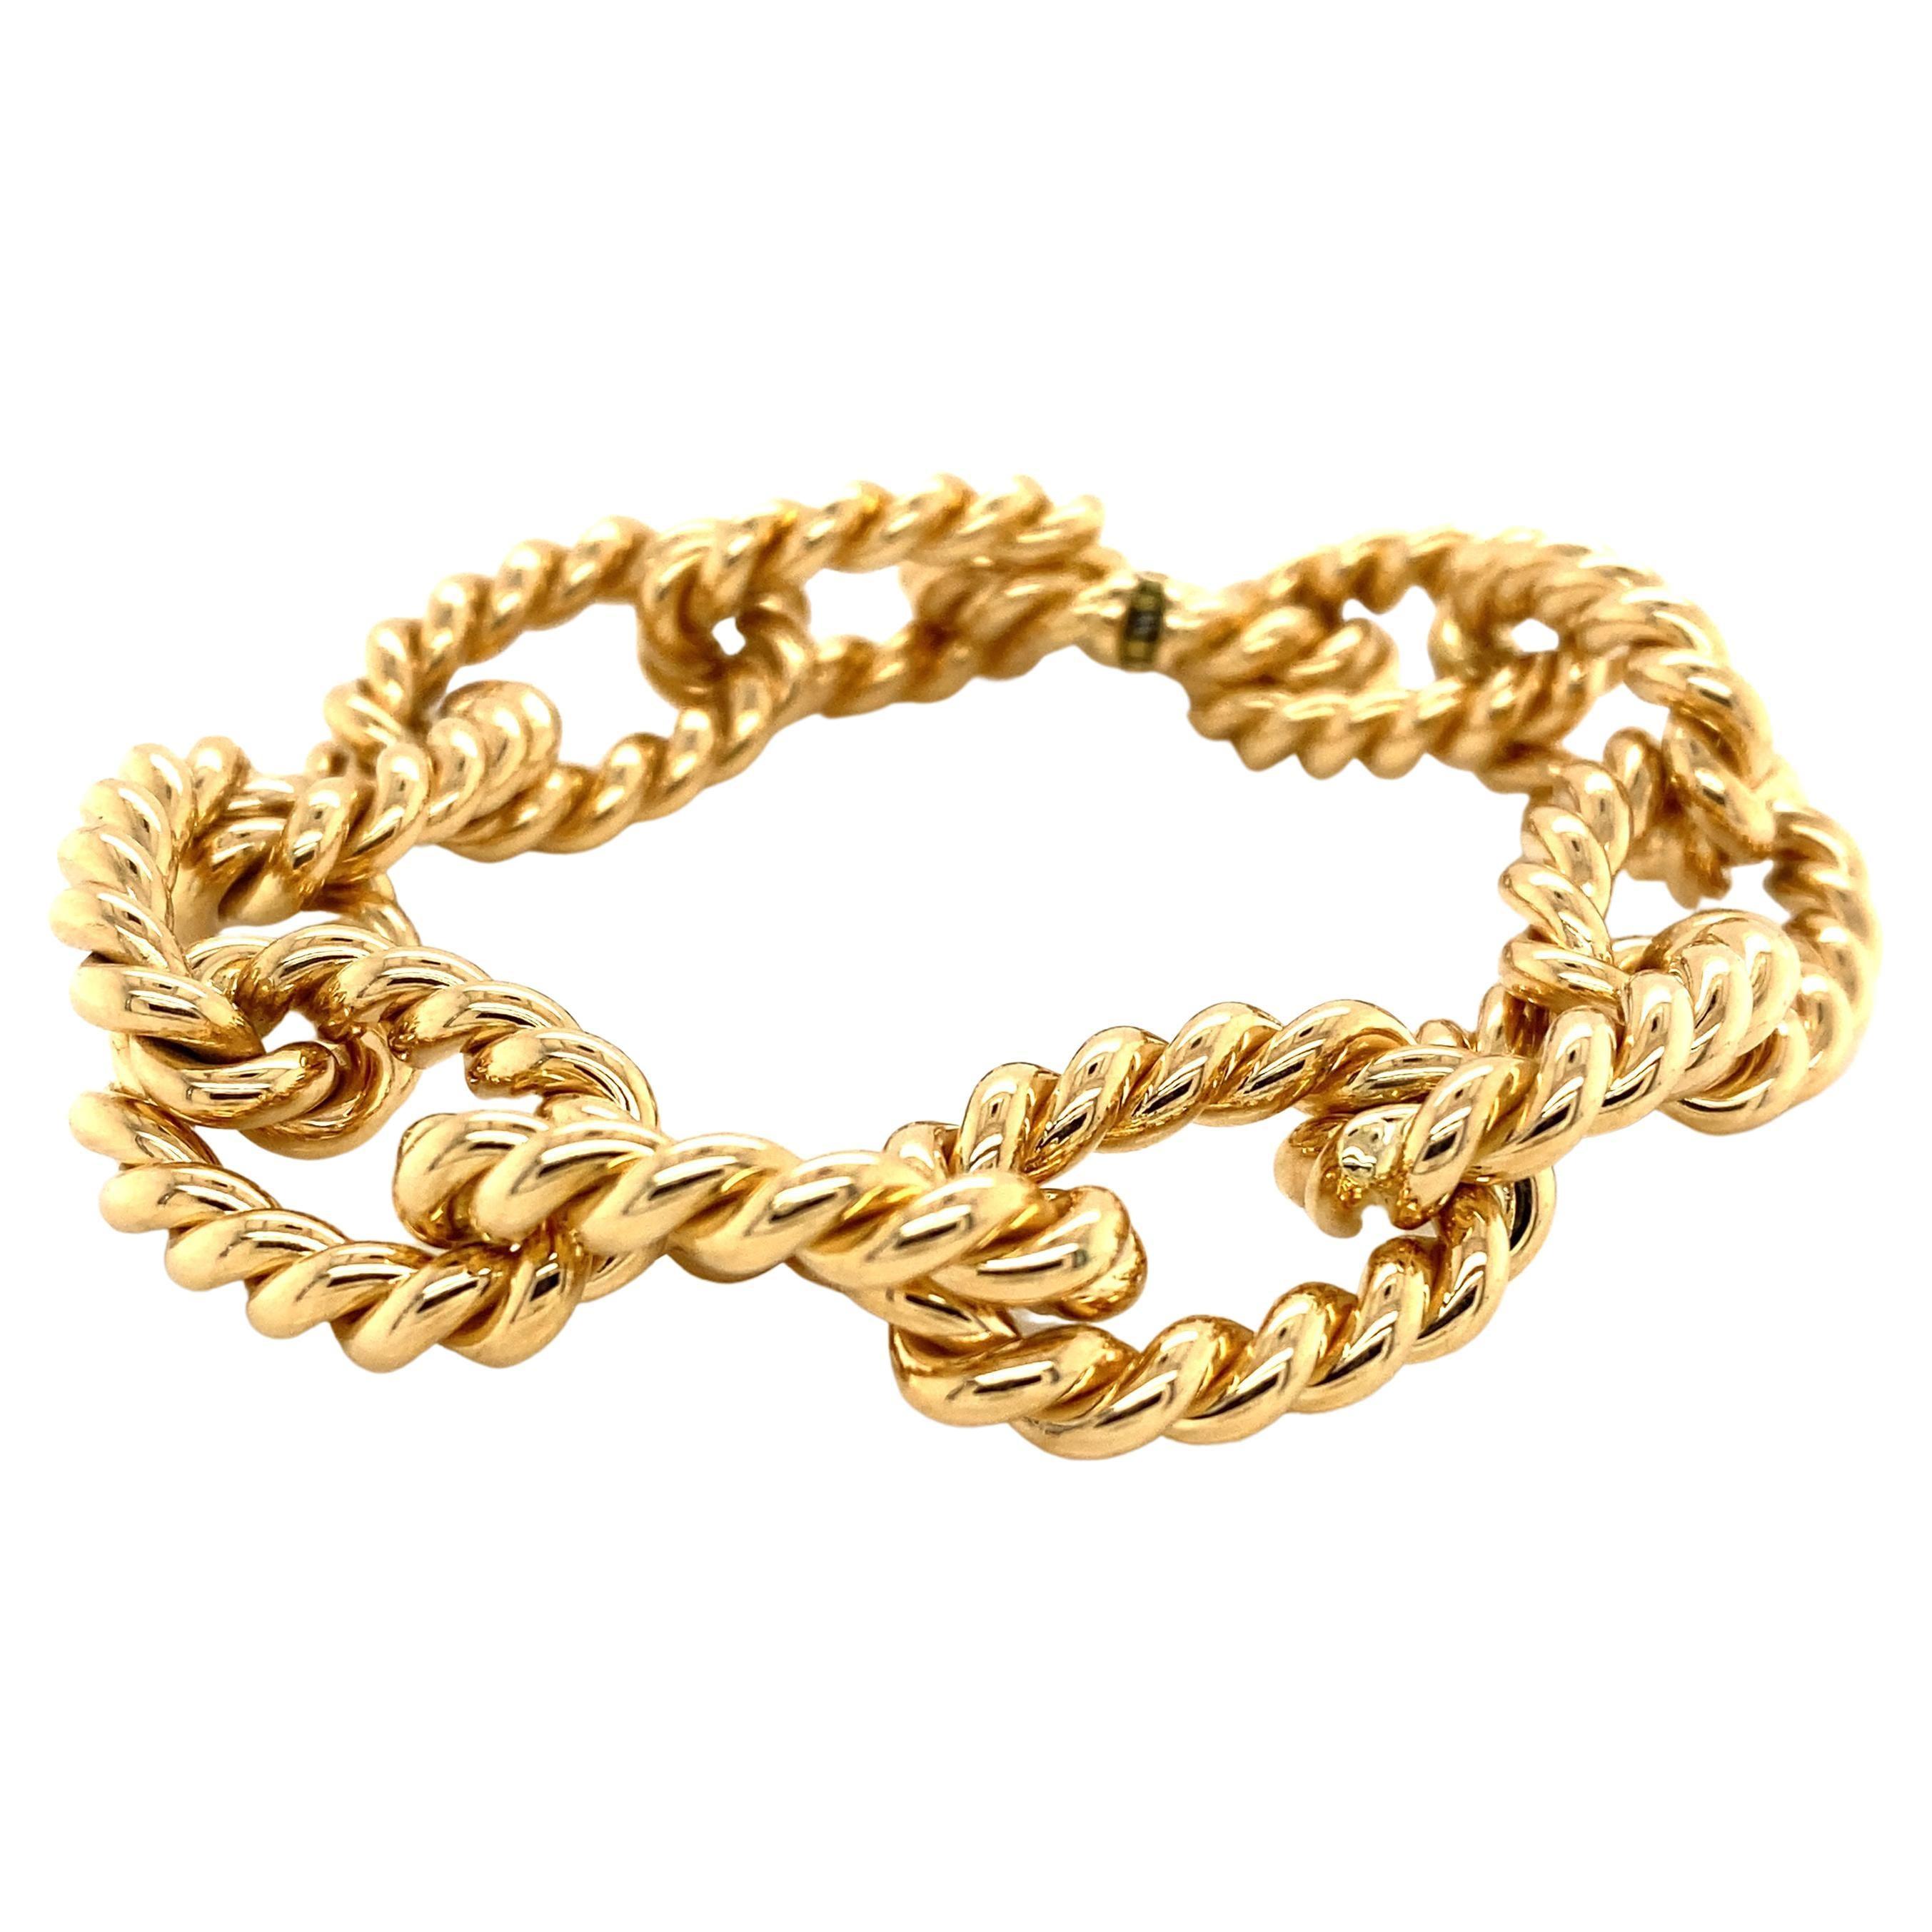 Gourmet Bracelet 18K Yellow Gold